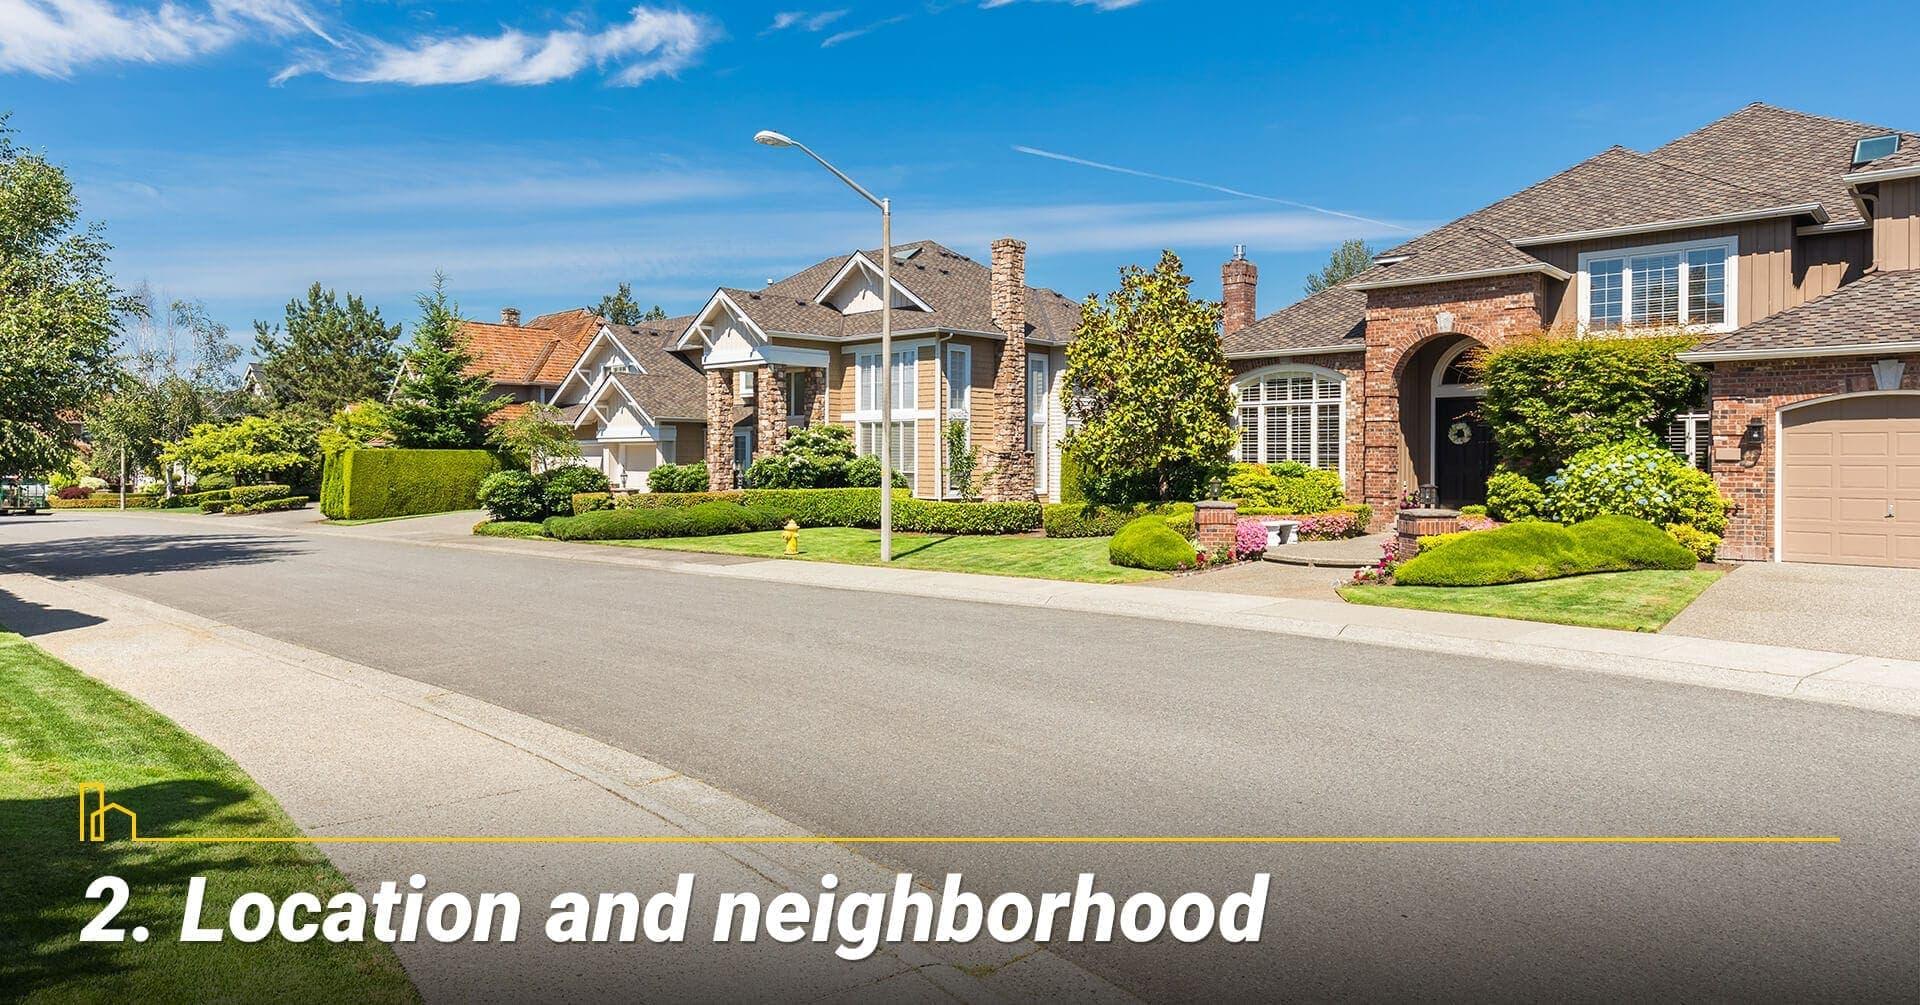 Location and neighborhood